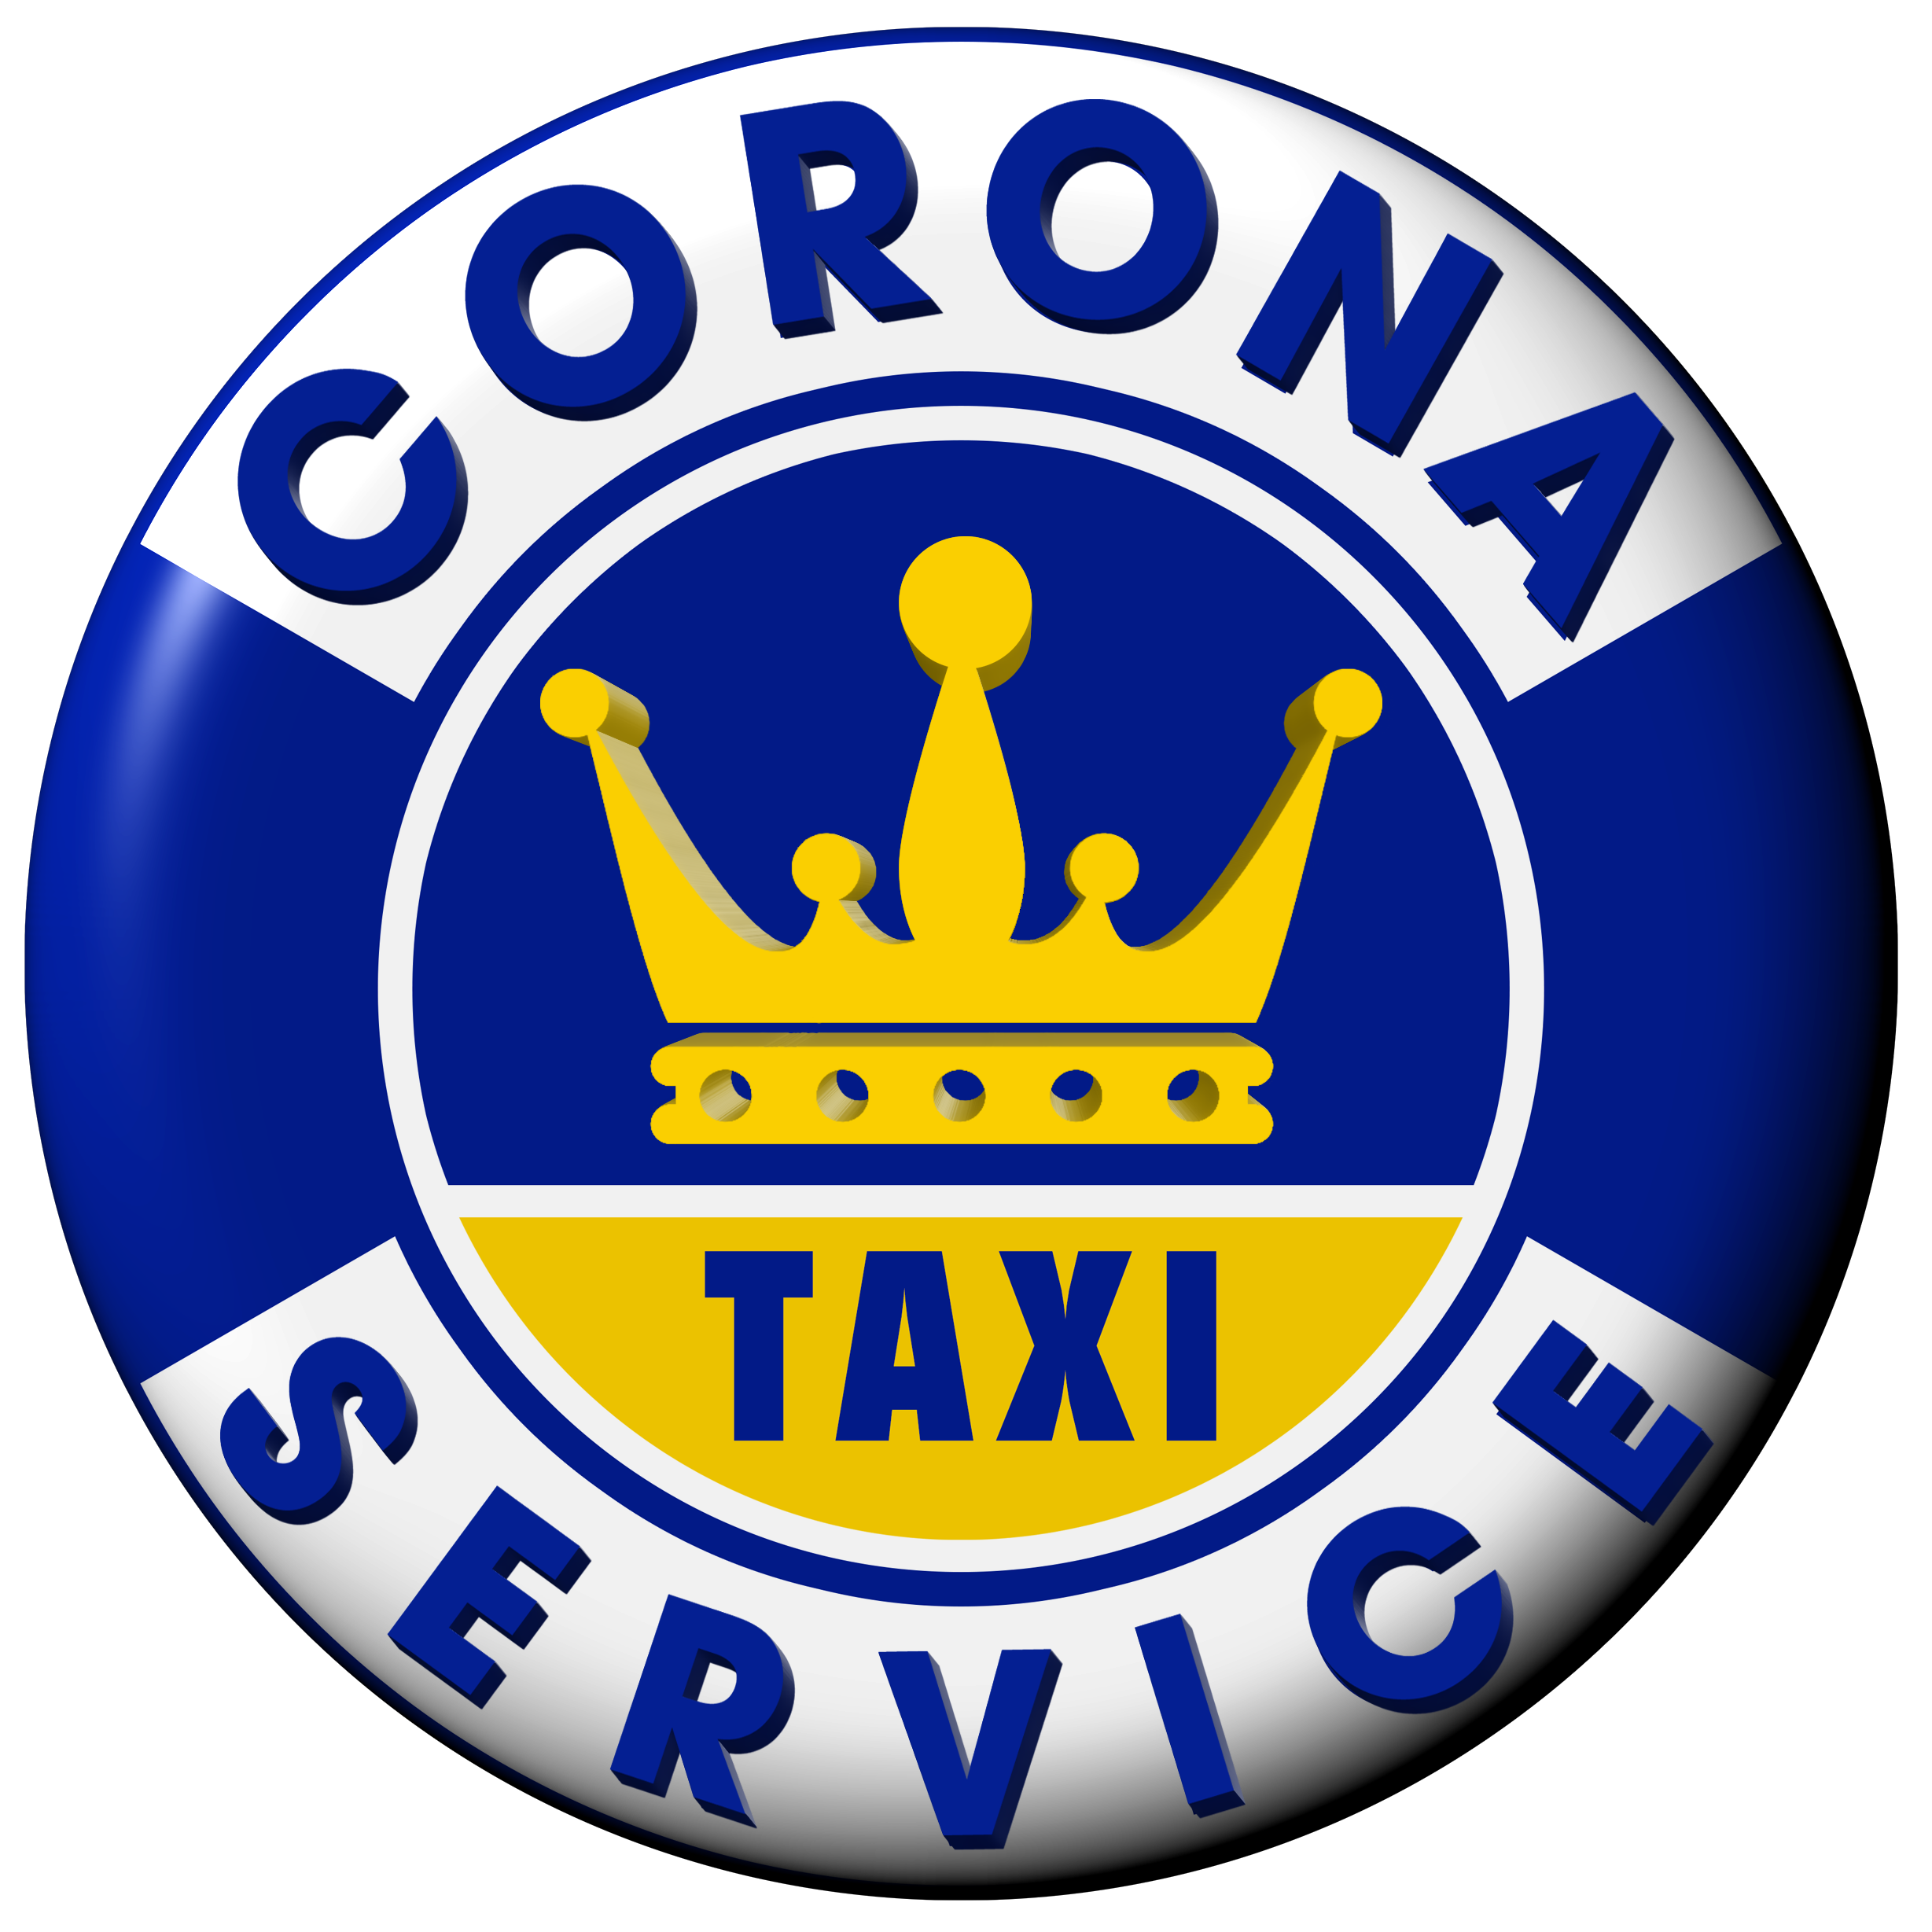 Corona Taxi Services - Brentwood, NY 11717 - (631)375-4170 | ShowMeLocal.com